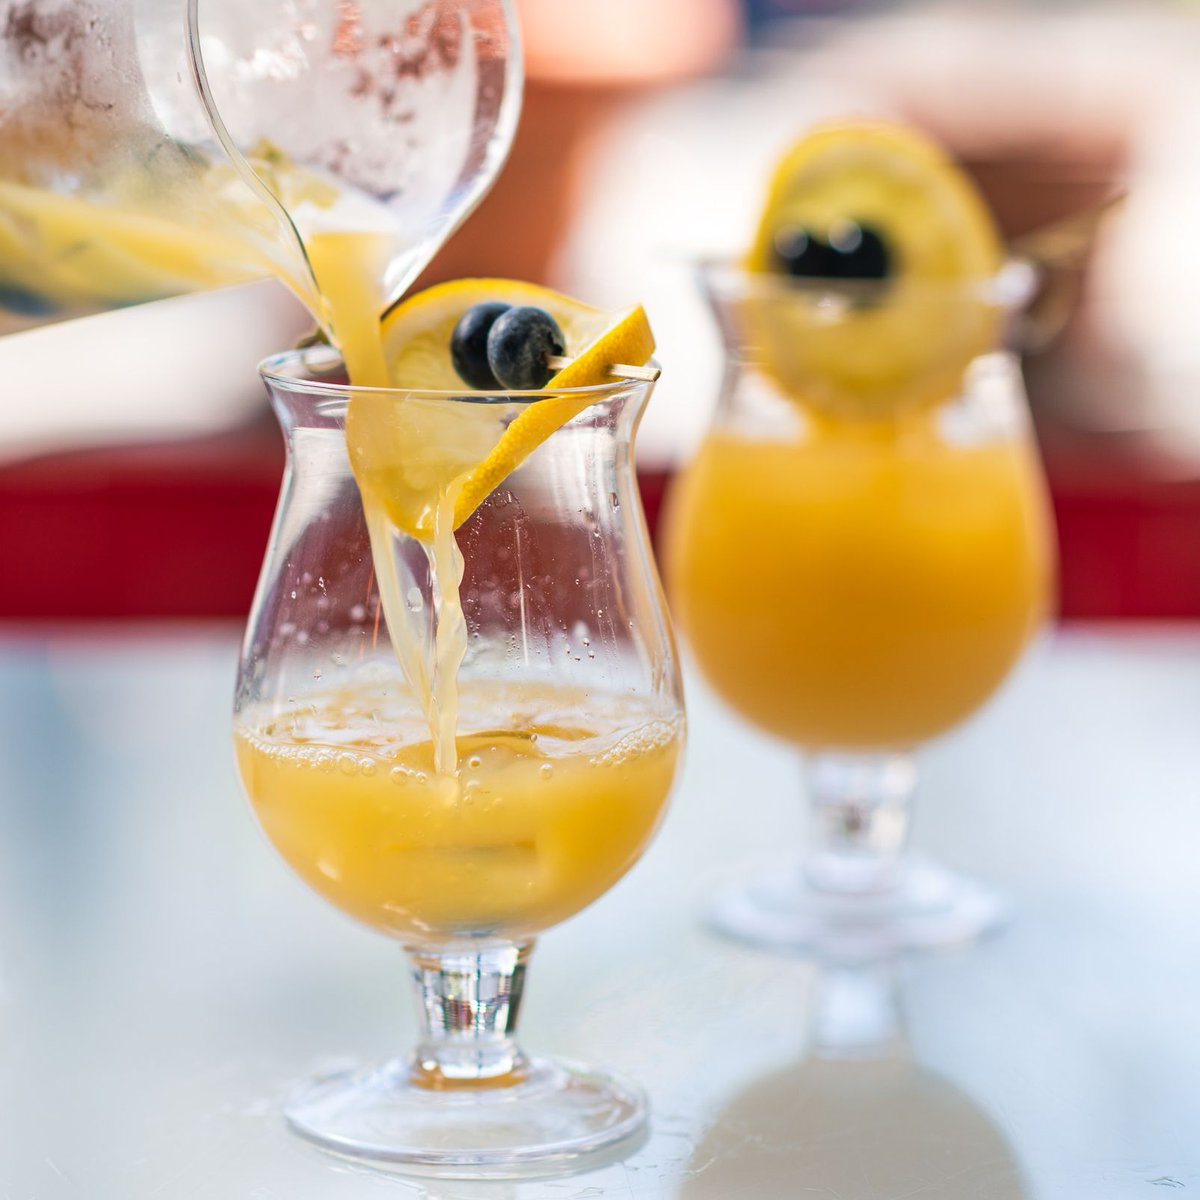 In the mood for #daydrinks? The #brunchbar is open from 10 to 3! #sundayfunday #sundaybrunch #sindesserts #eatwicked #drinkwickedtoo #mimosas #pvd #rhodeislander #eatdrinkripic.twitter.com/AW4HpurWFH